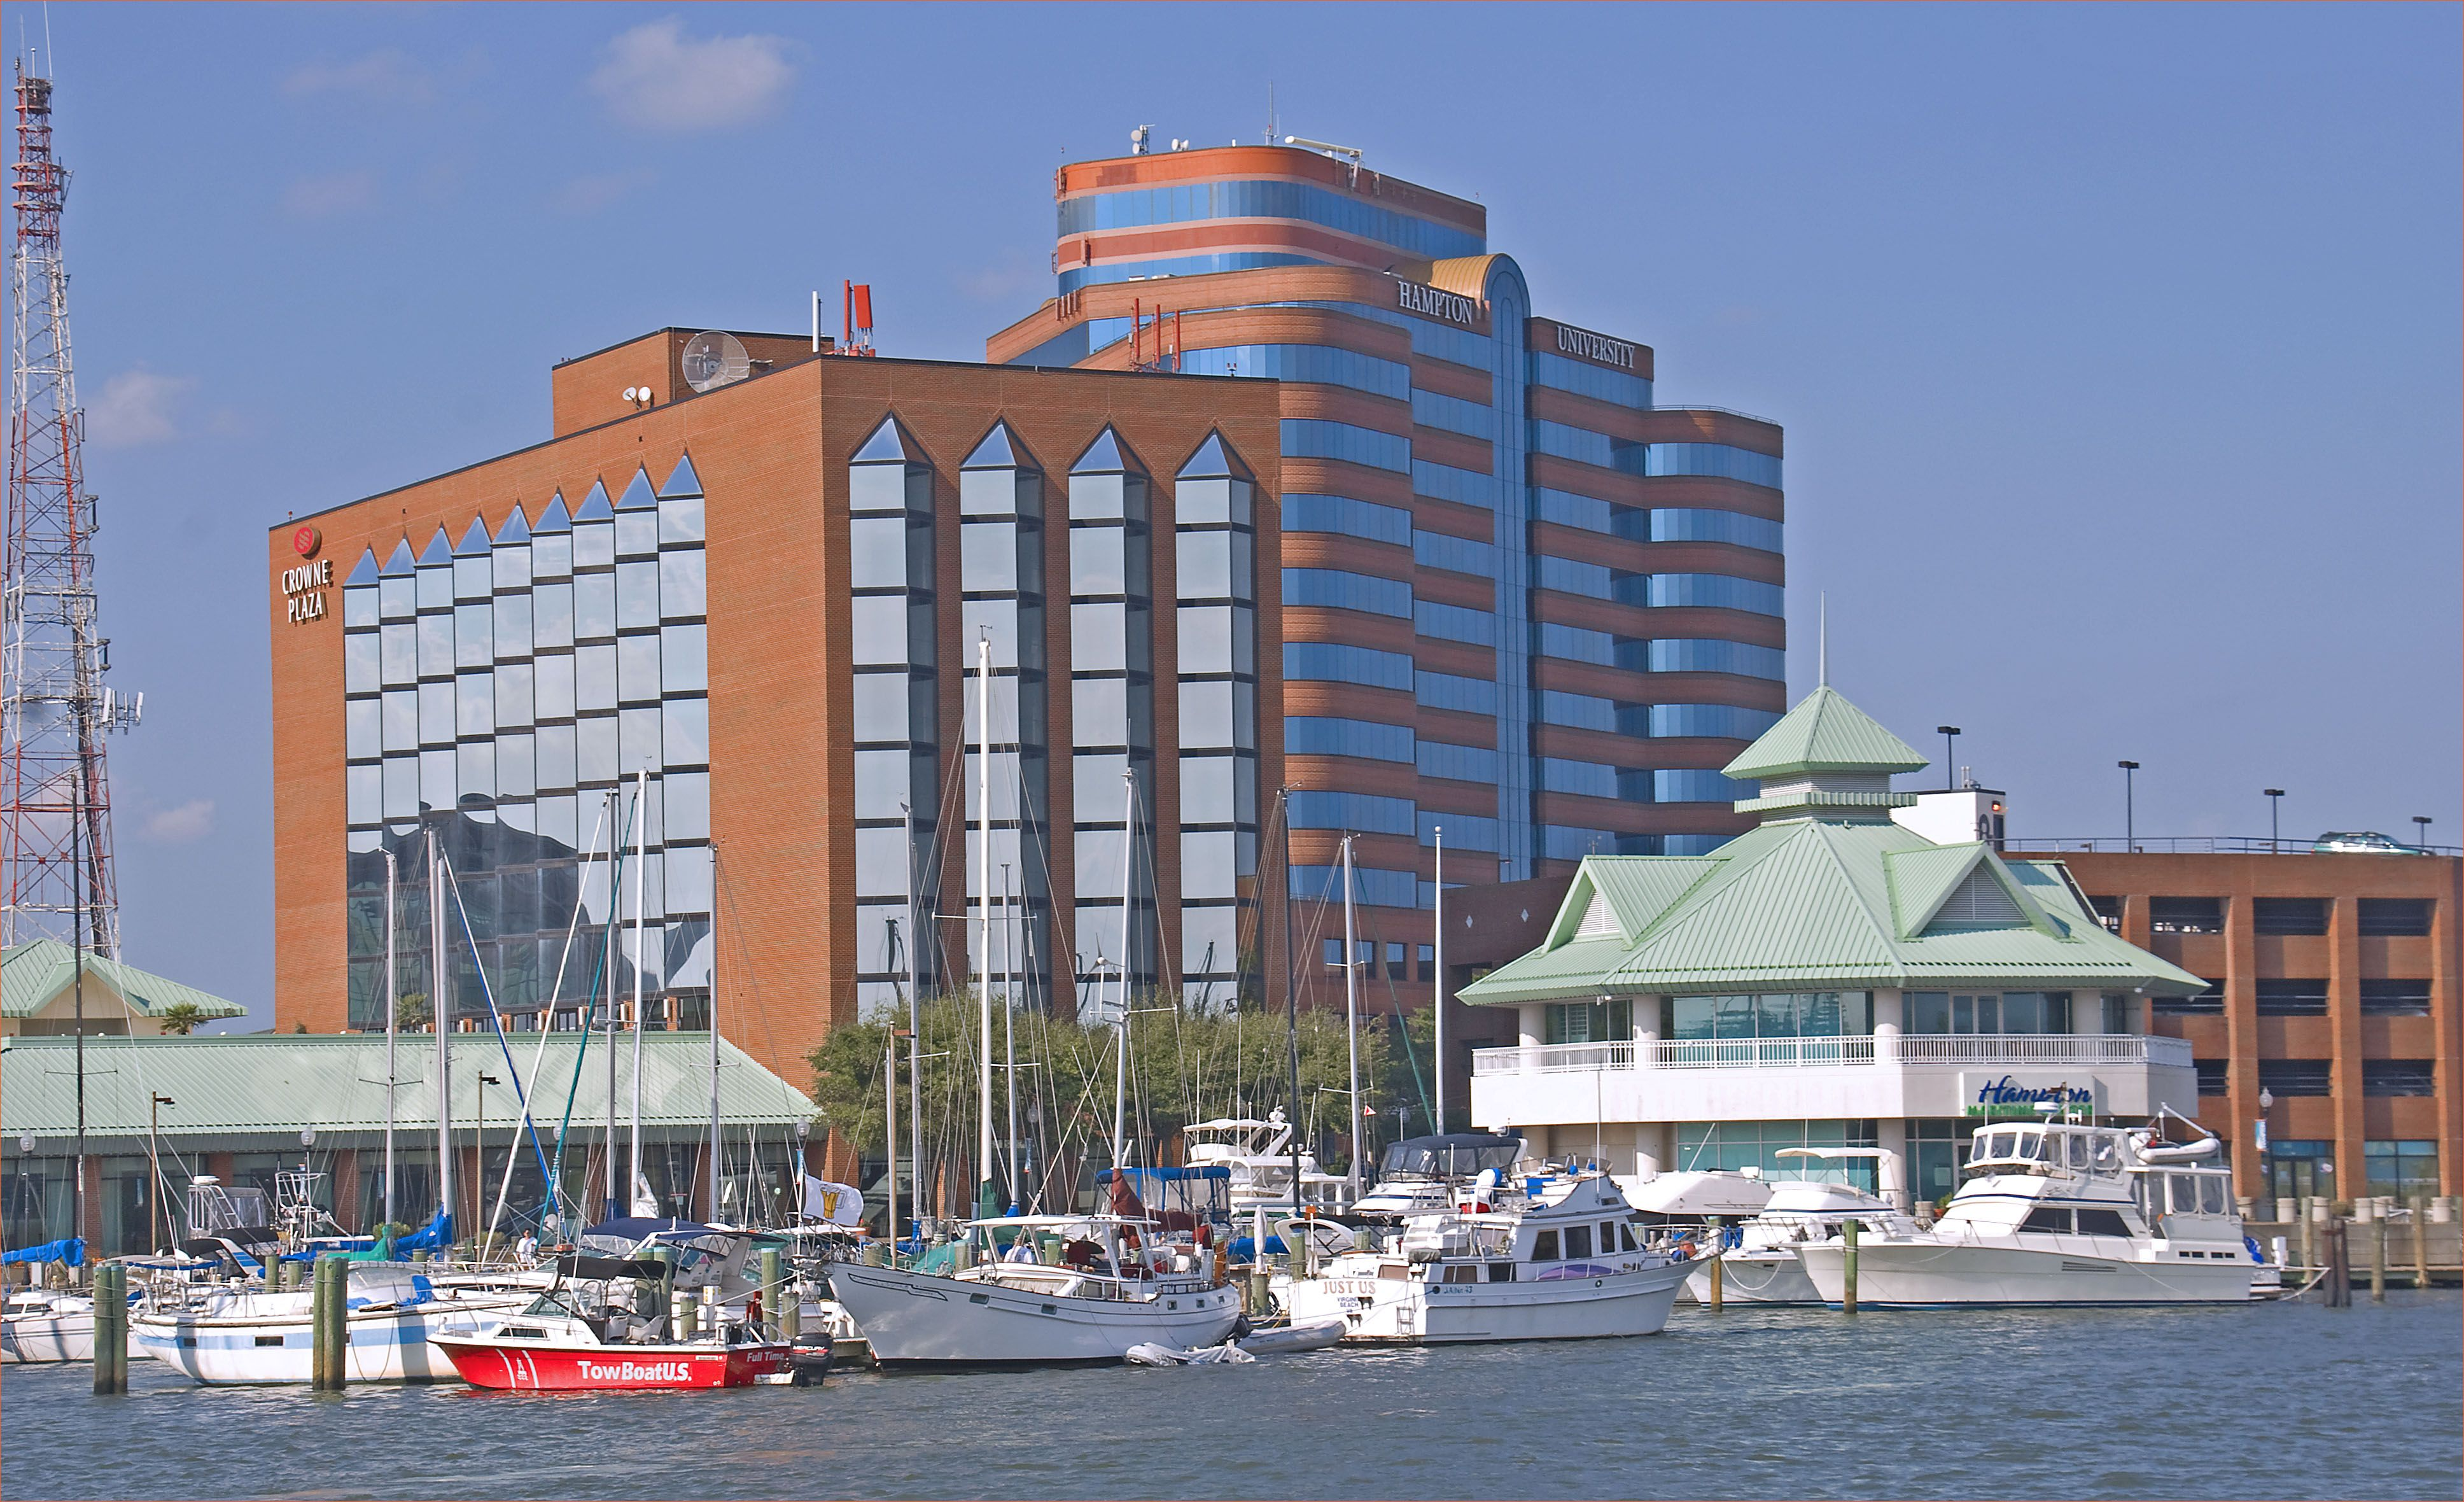 Crowne Plaza Hotel Hampton University And Marina